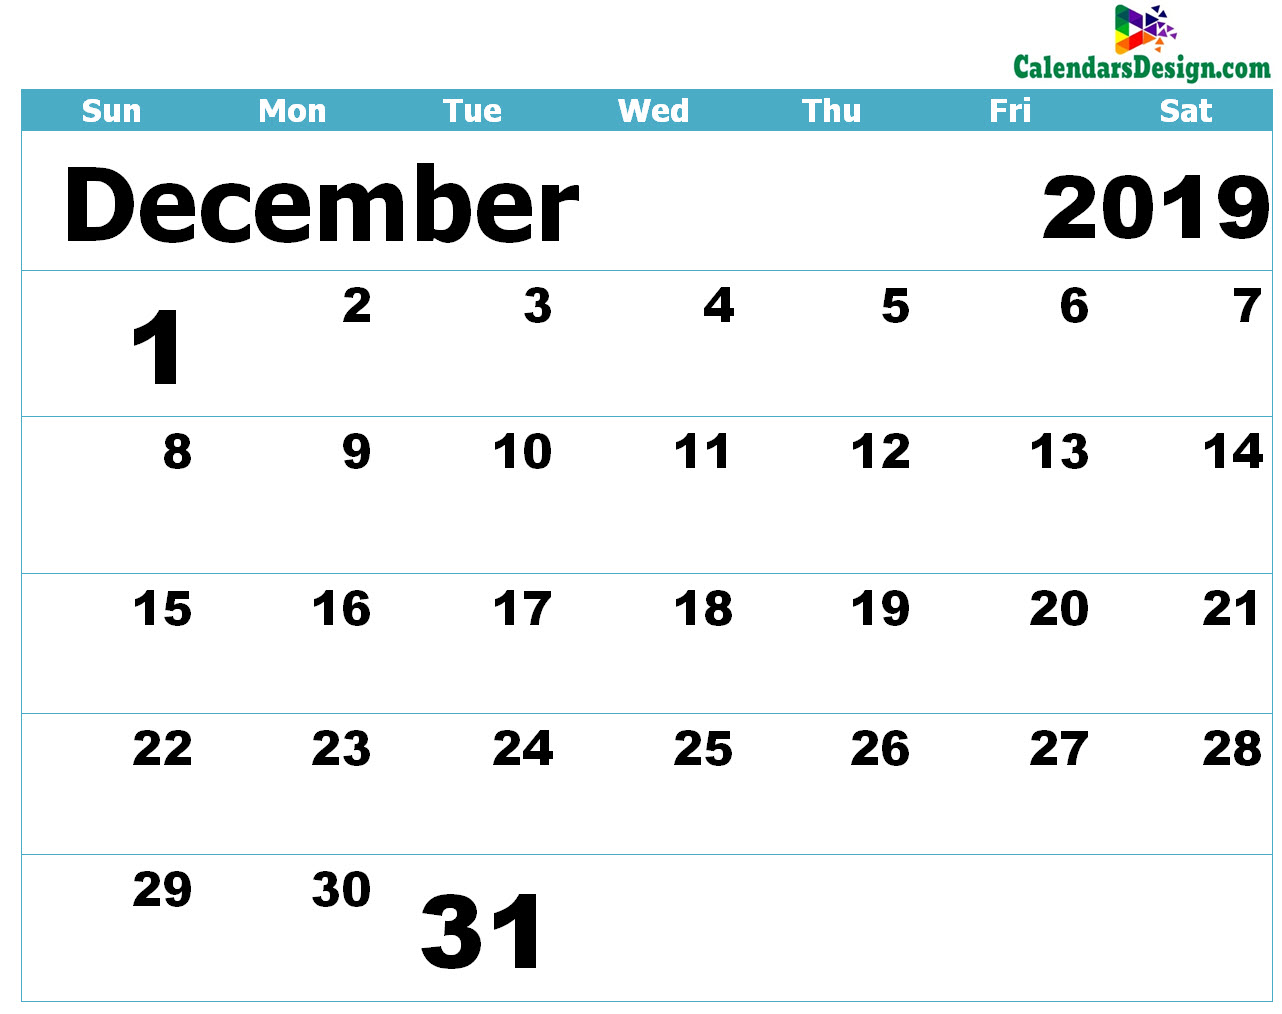 December 2019 Calendar Blank Template